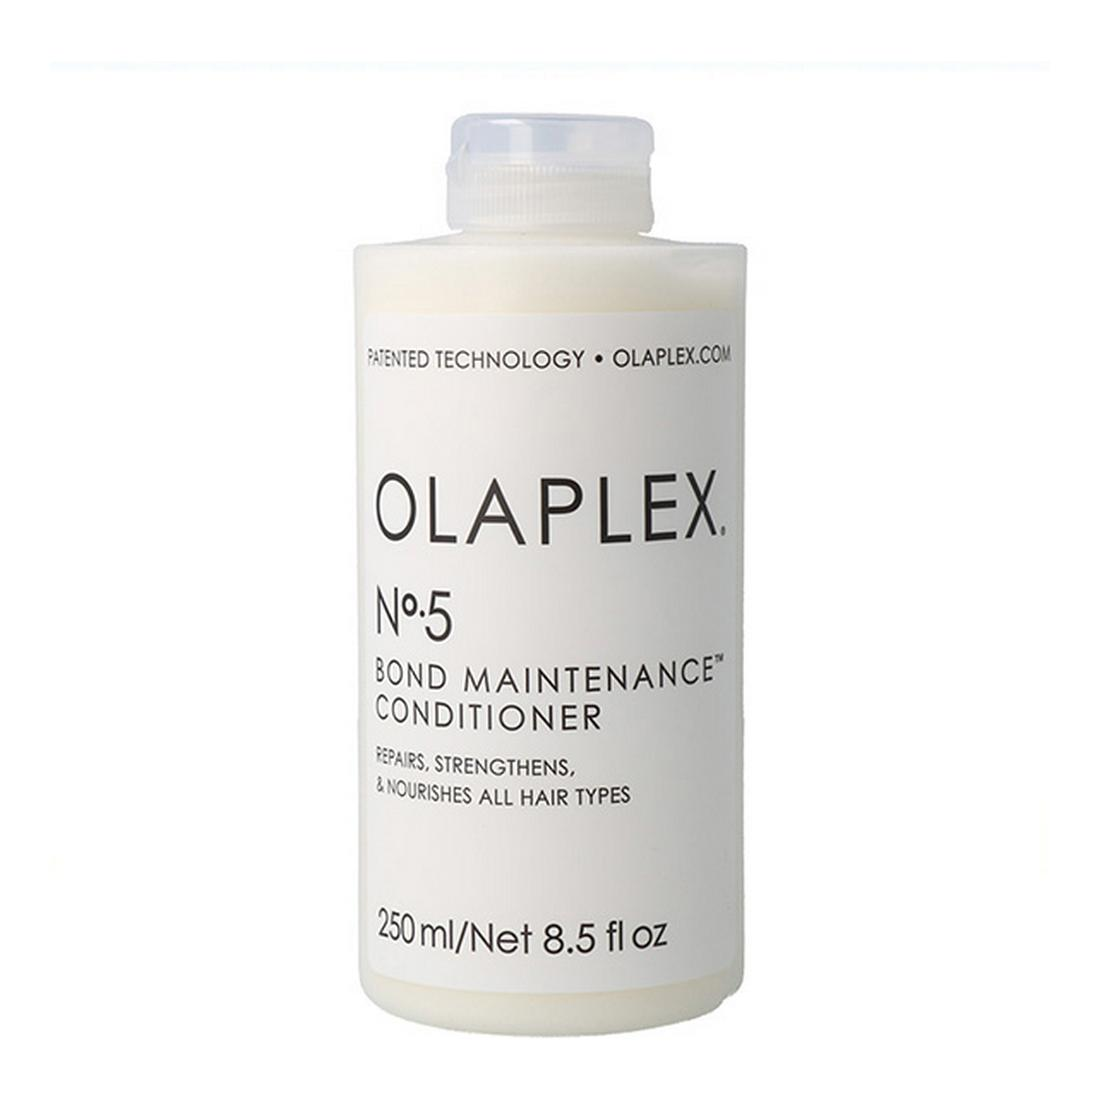 Bond Maintenance Conditioner No.5 - Olaplex - 250 ml - hc